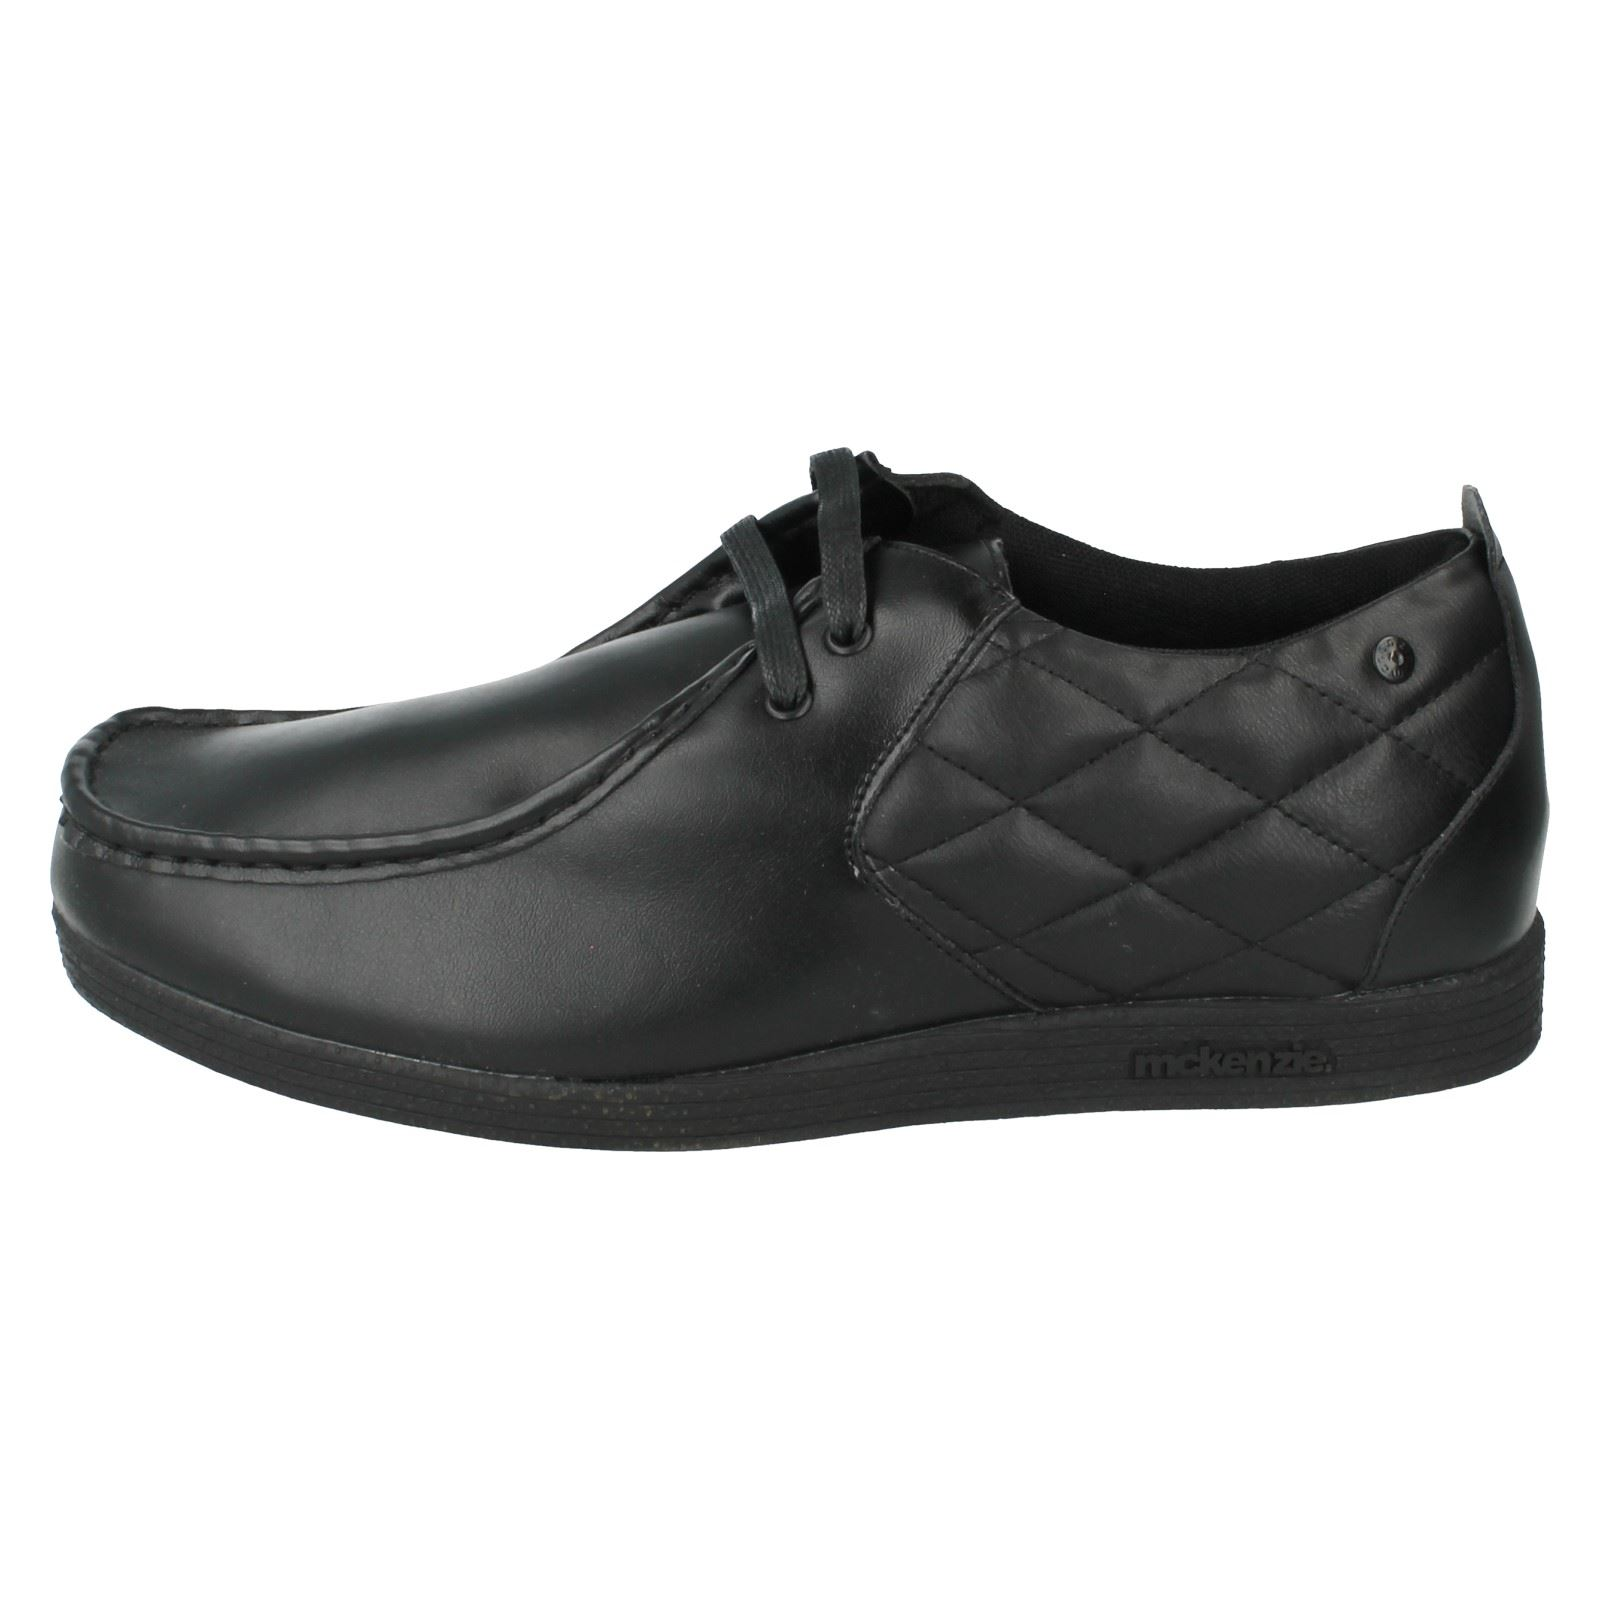 chaussure femme italienne promo,mackenzie chaussure homme